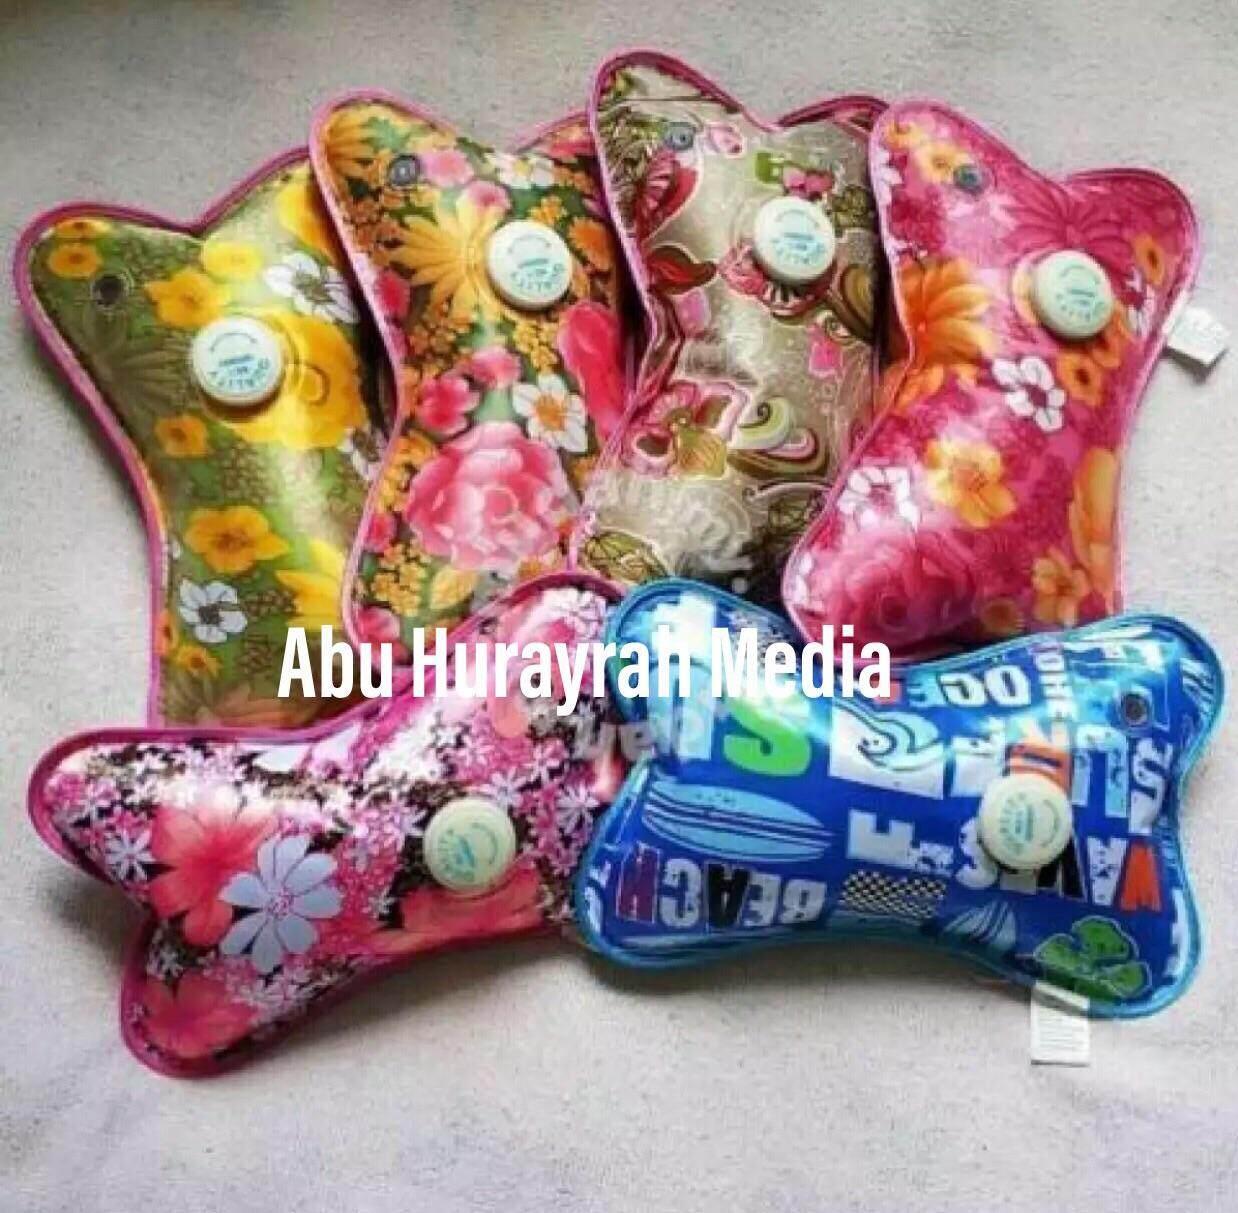 Hot Pillow (tungku Elektrik / Bantal Panas) + Free Gift By Abu Hurayrah Media.